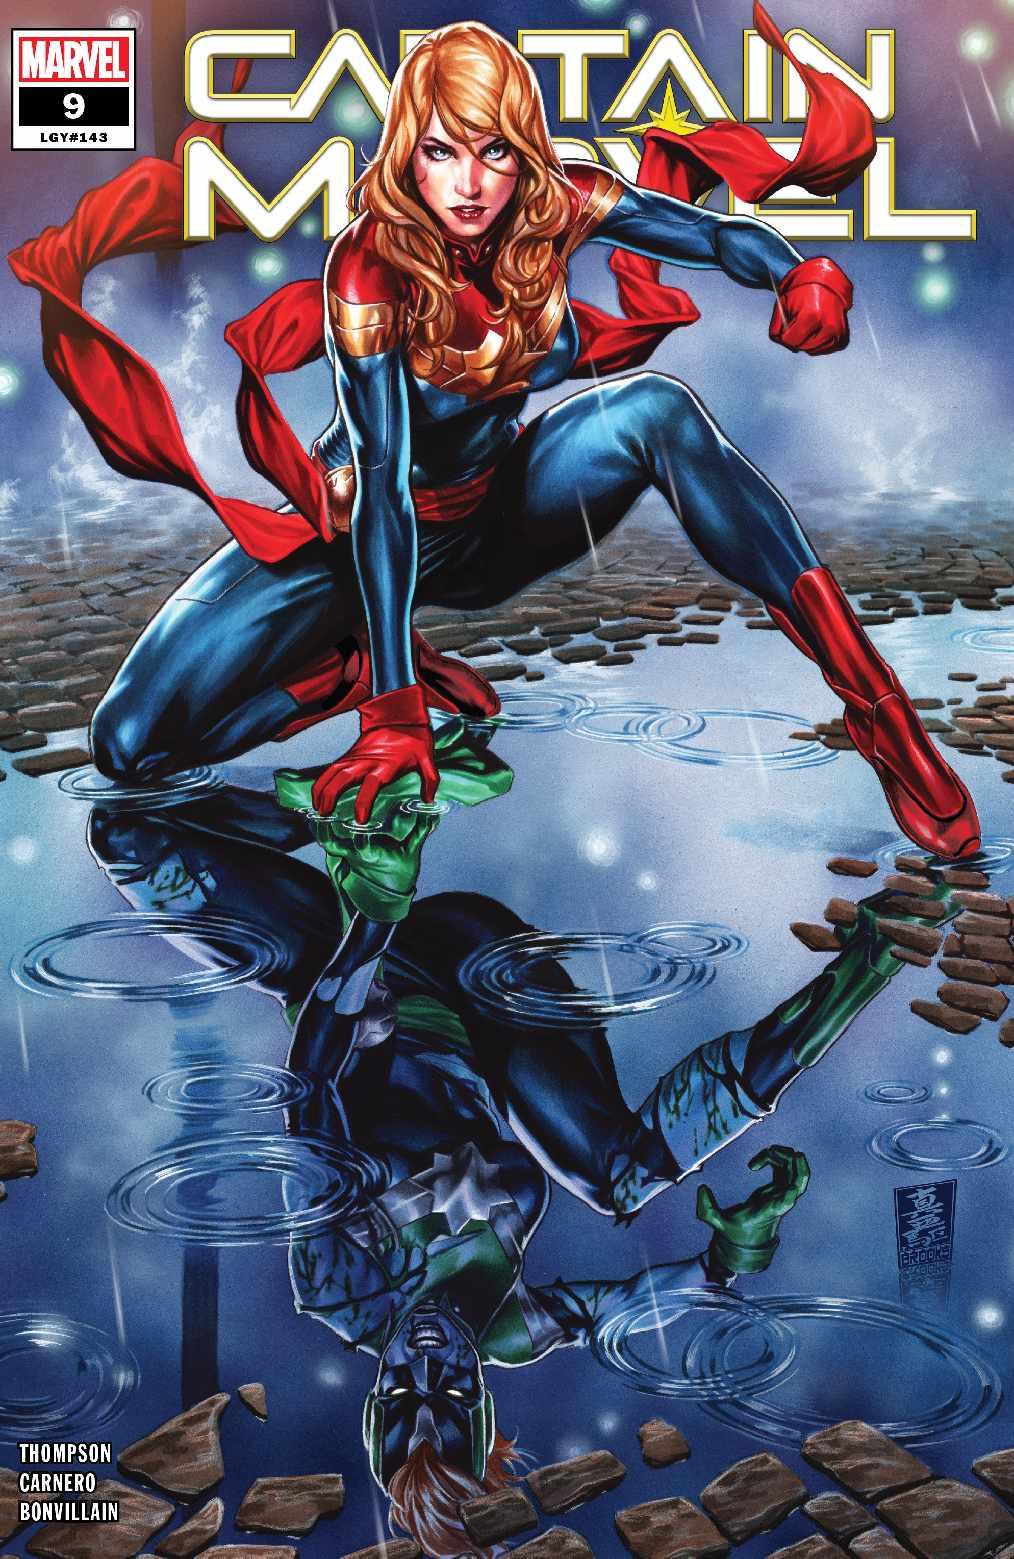 read comics online free - captain marvel (2019) - chapter